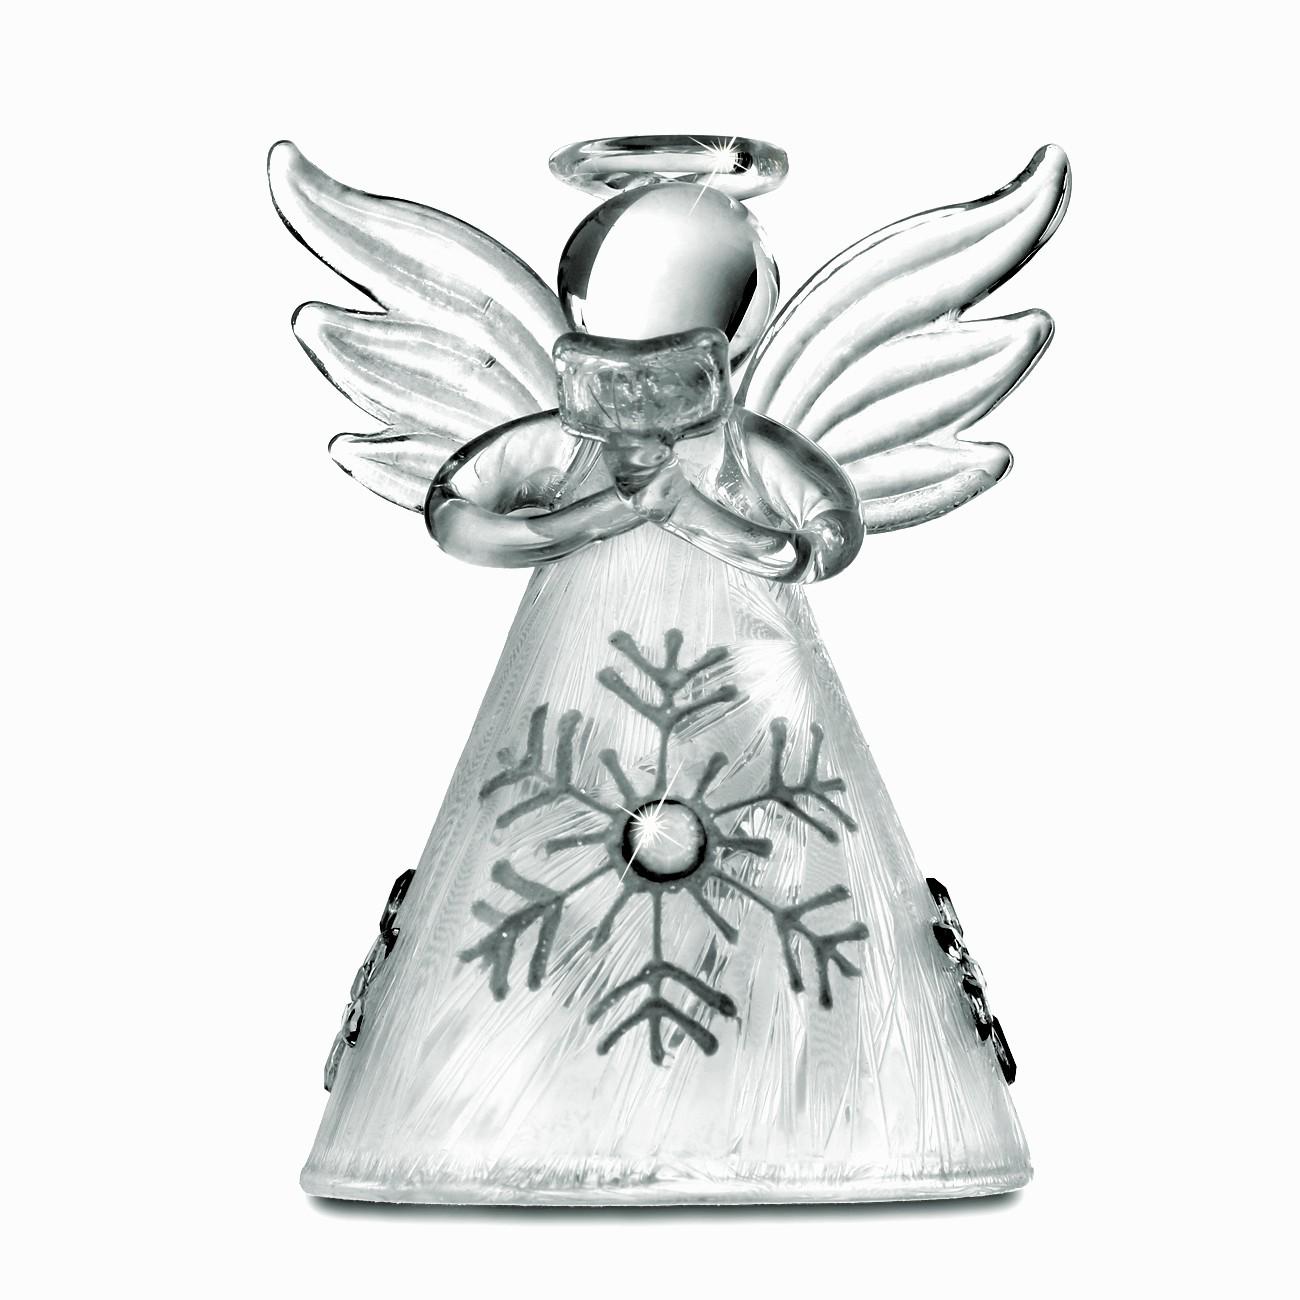 sikora christbaumschmuck aus glas engel mit eiskristall 3er set h 7cm christbaumschmuck. Black Bedroom Furniture Sets. Home Design Ideas